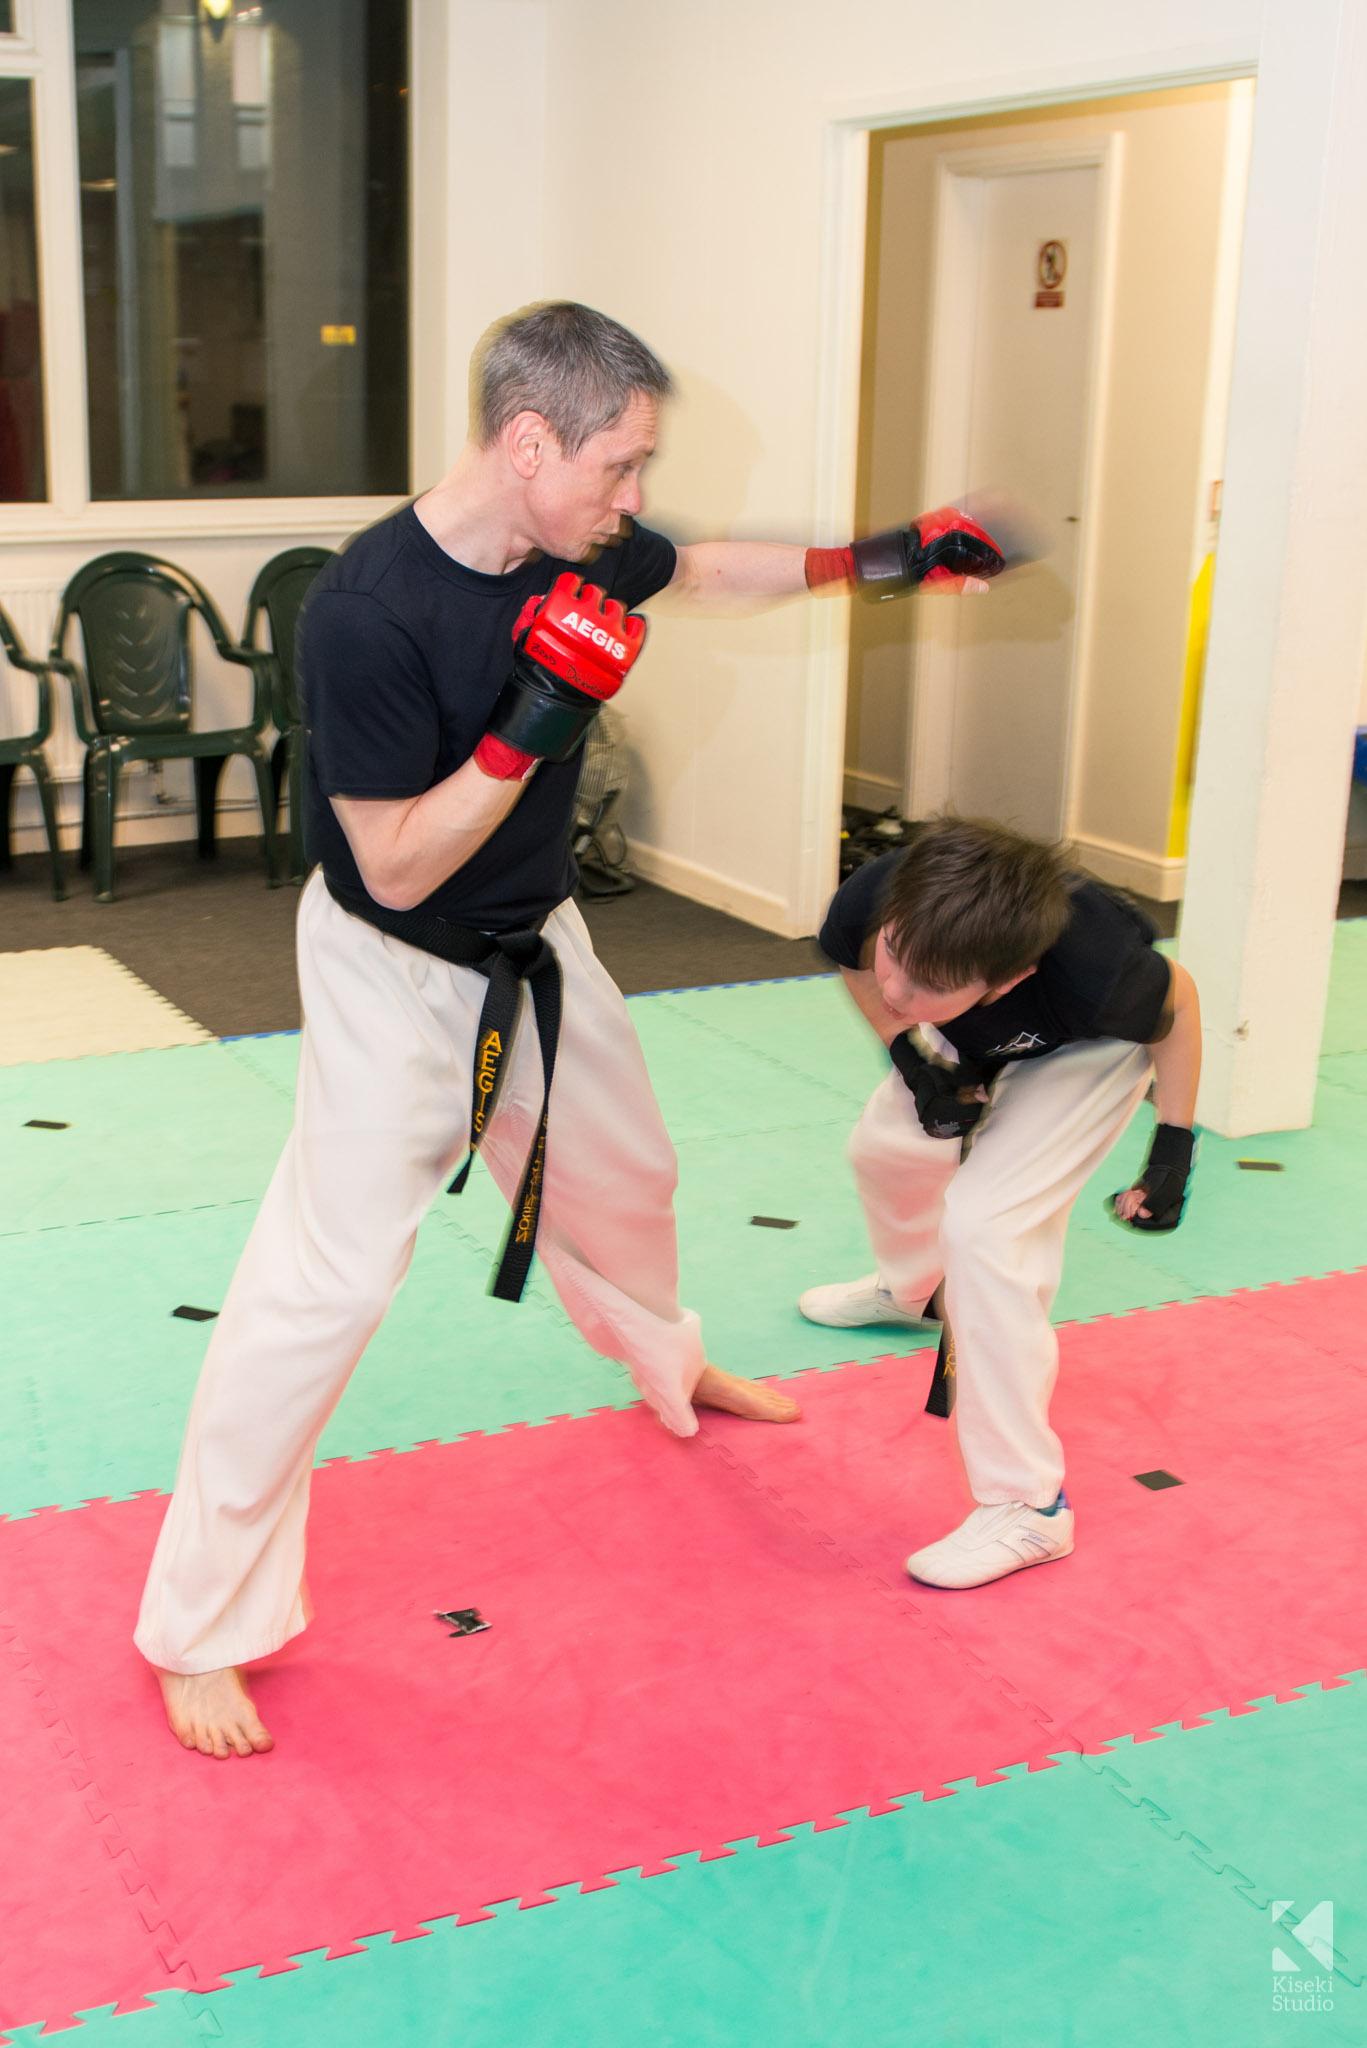 aegis-martial-arts-class-leeds-dodging-punch